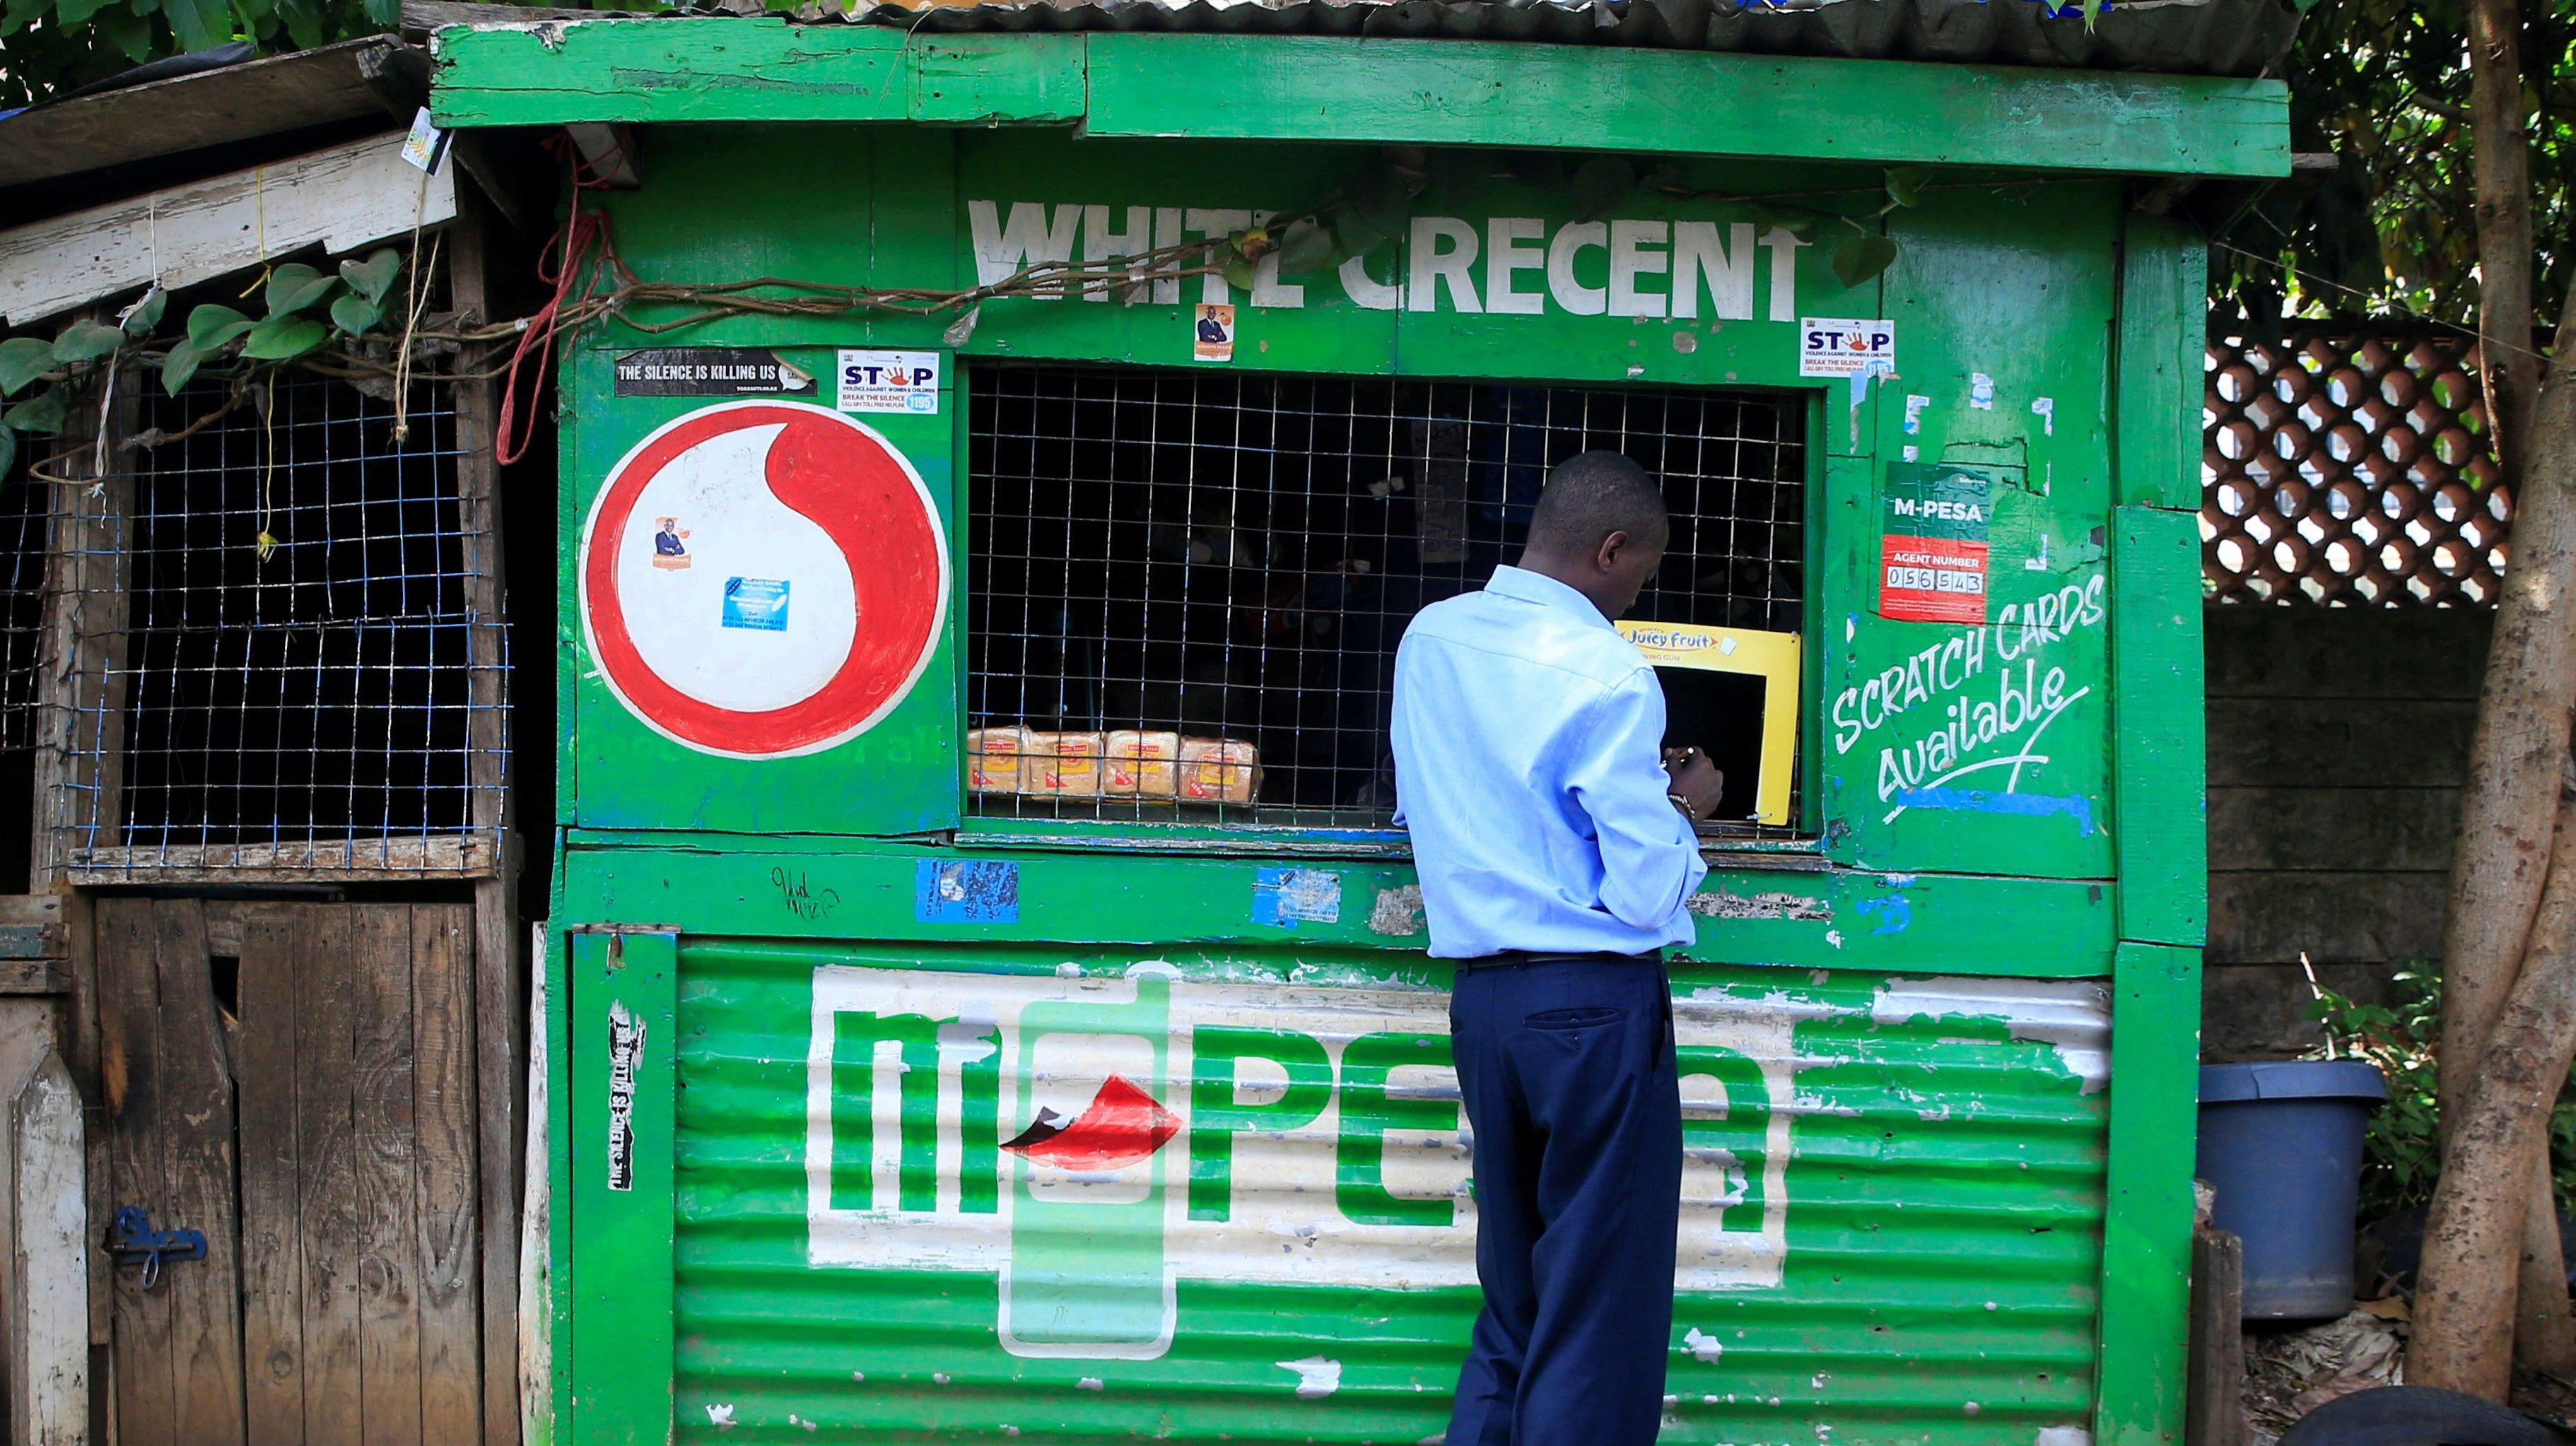 qz.com - Abdi Latif Dahir - Africa's dominant mobile money service is going global